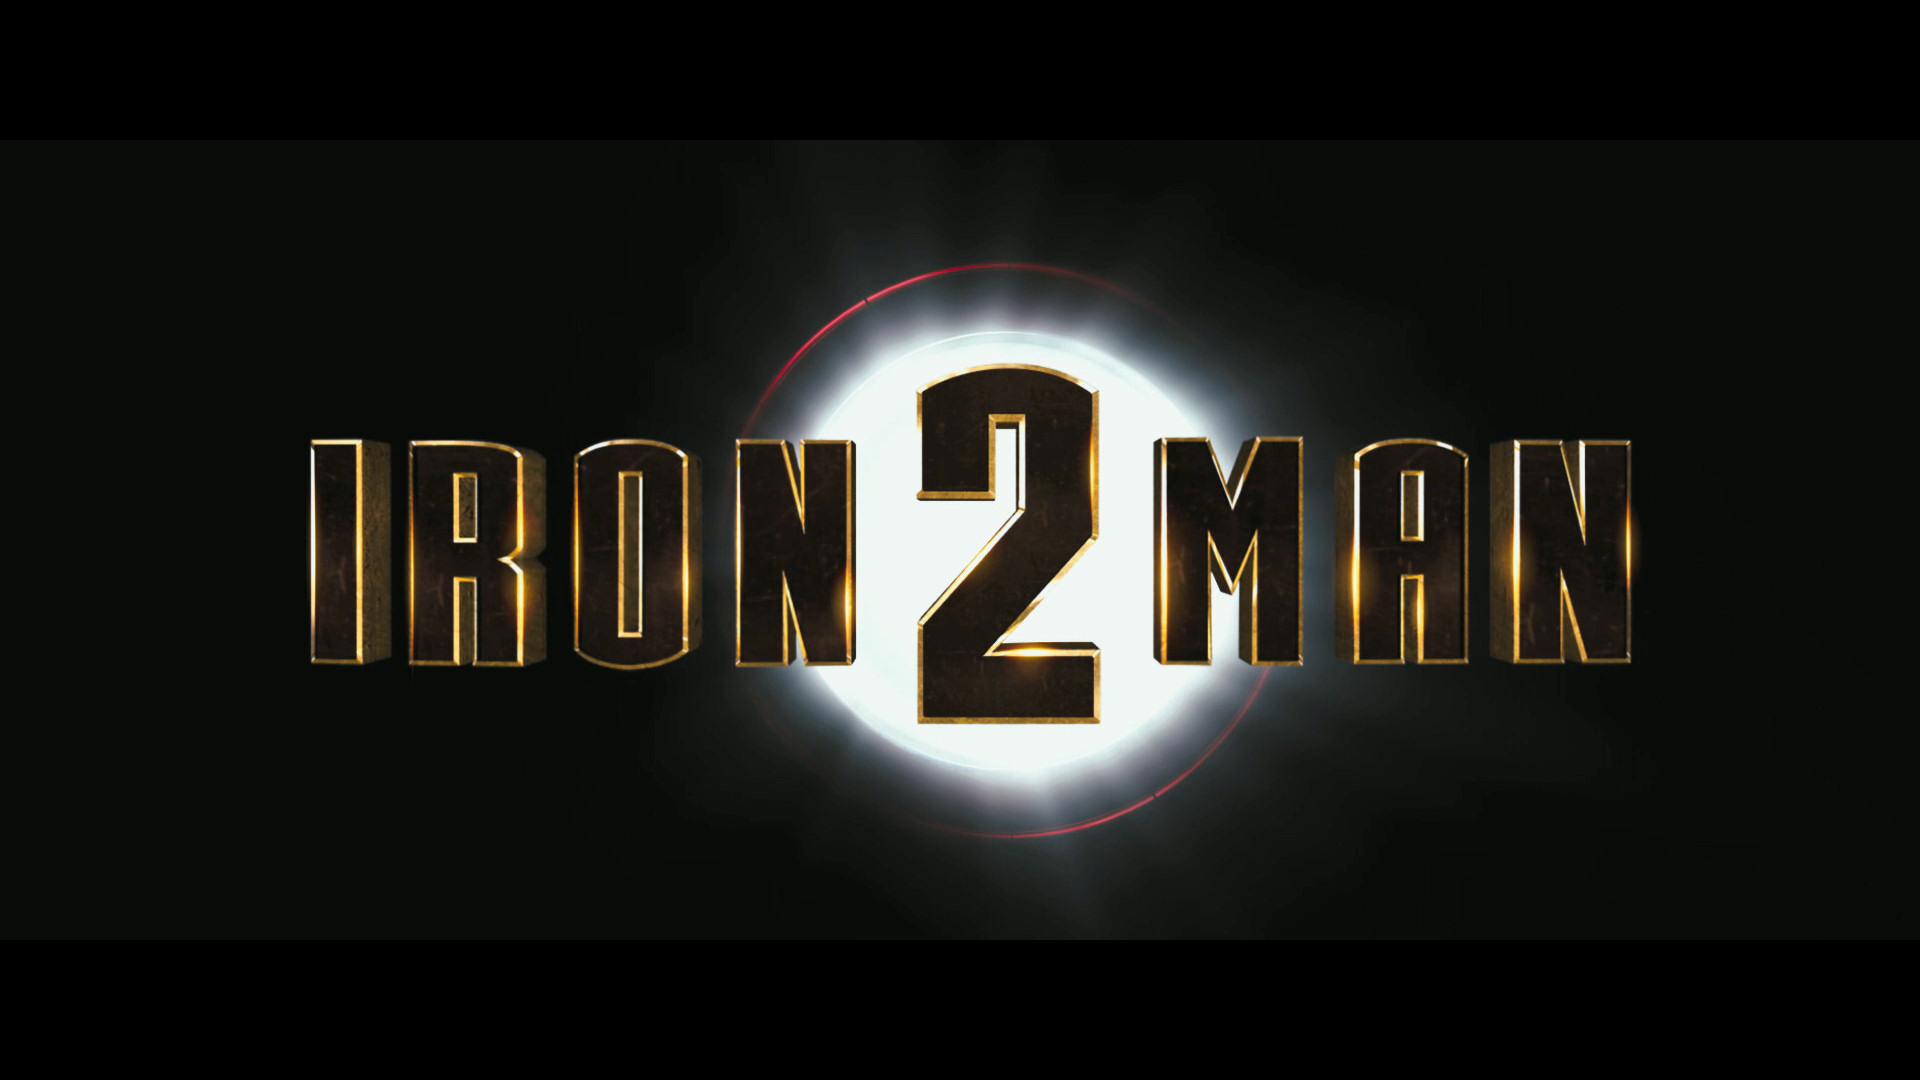 first marvel intro logo iron man 2008 - HD1600×1200